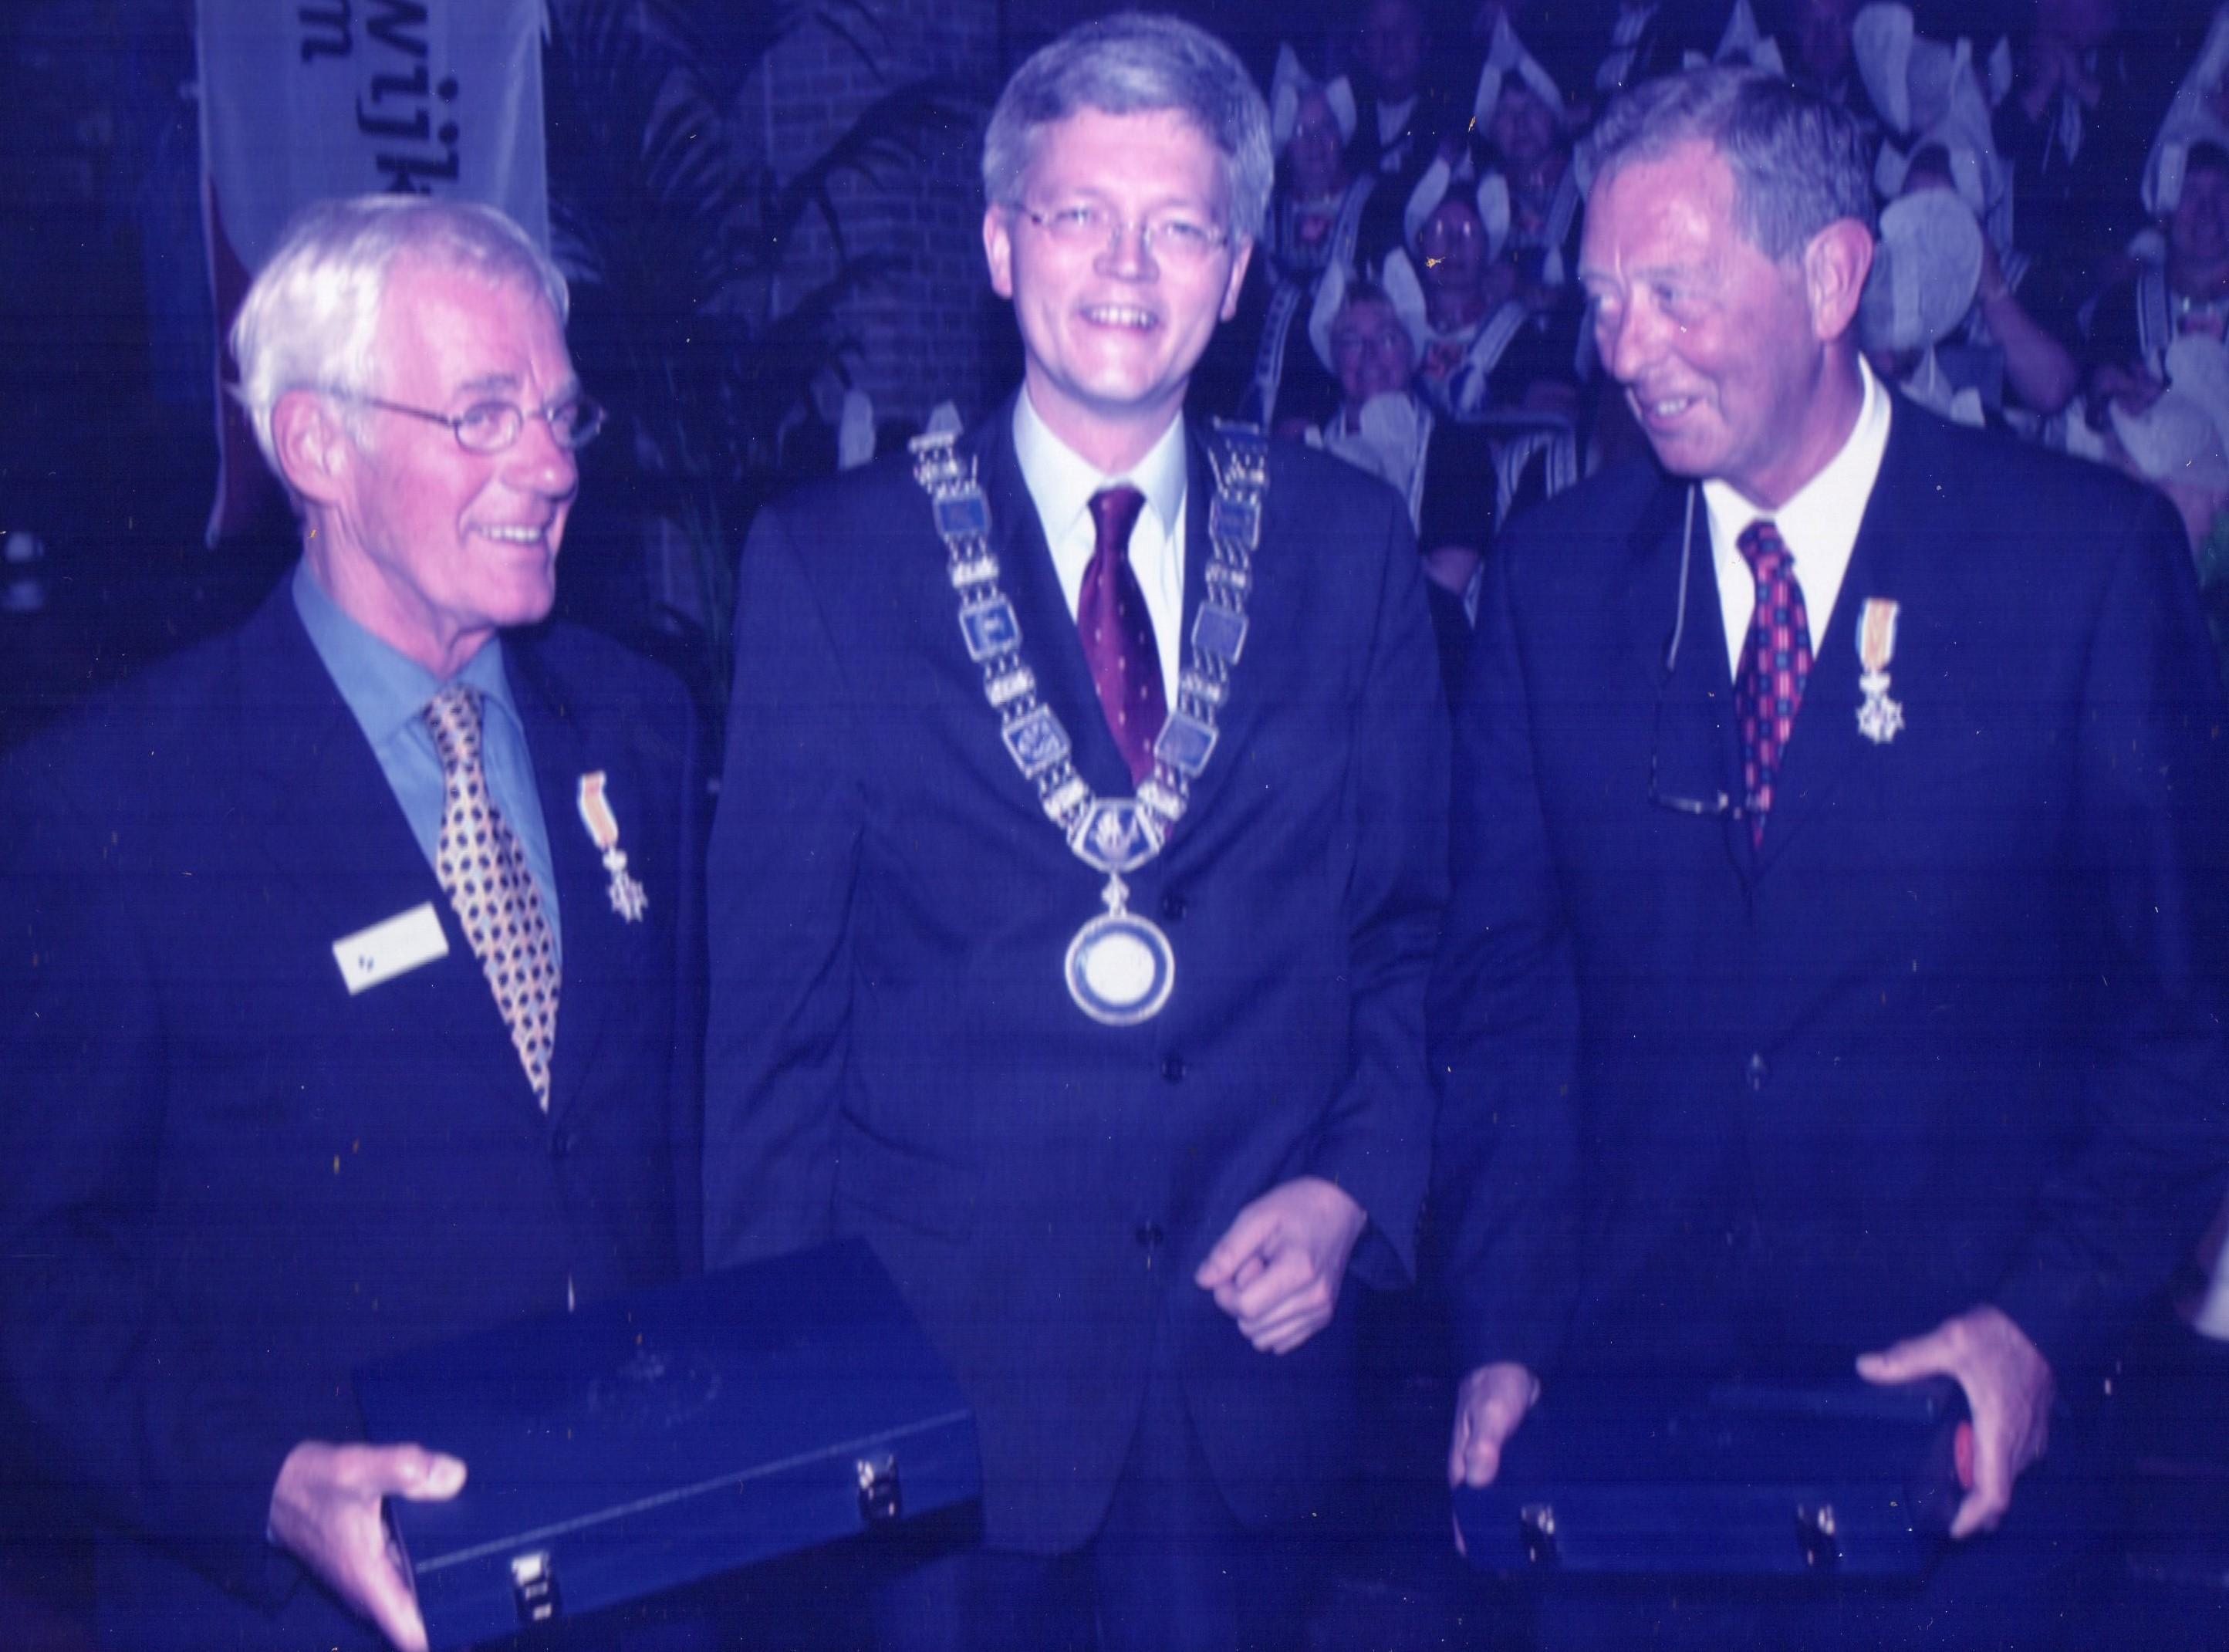 Piet Kochx 1932-2020: Een bruggenbouwer op de achtergrond